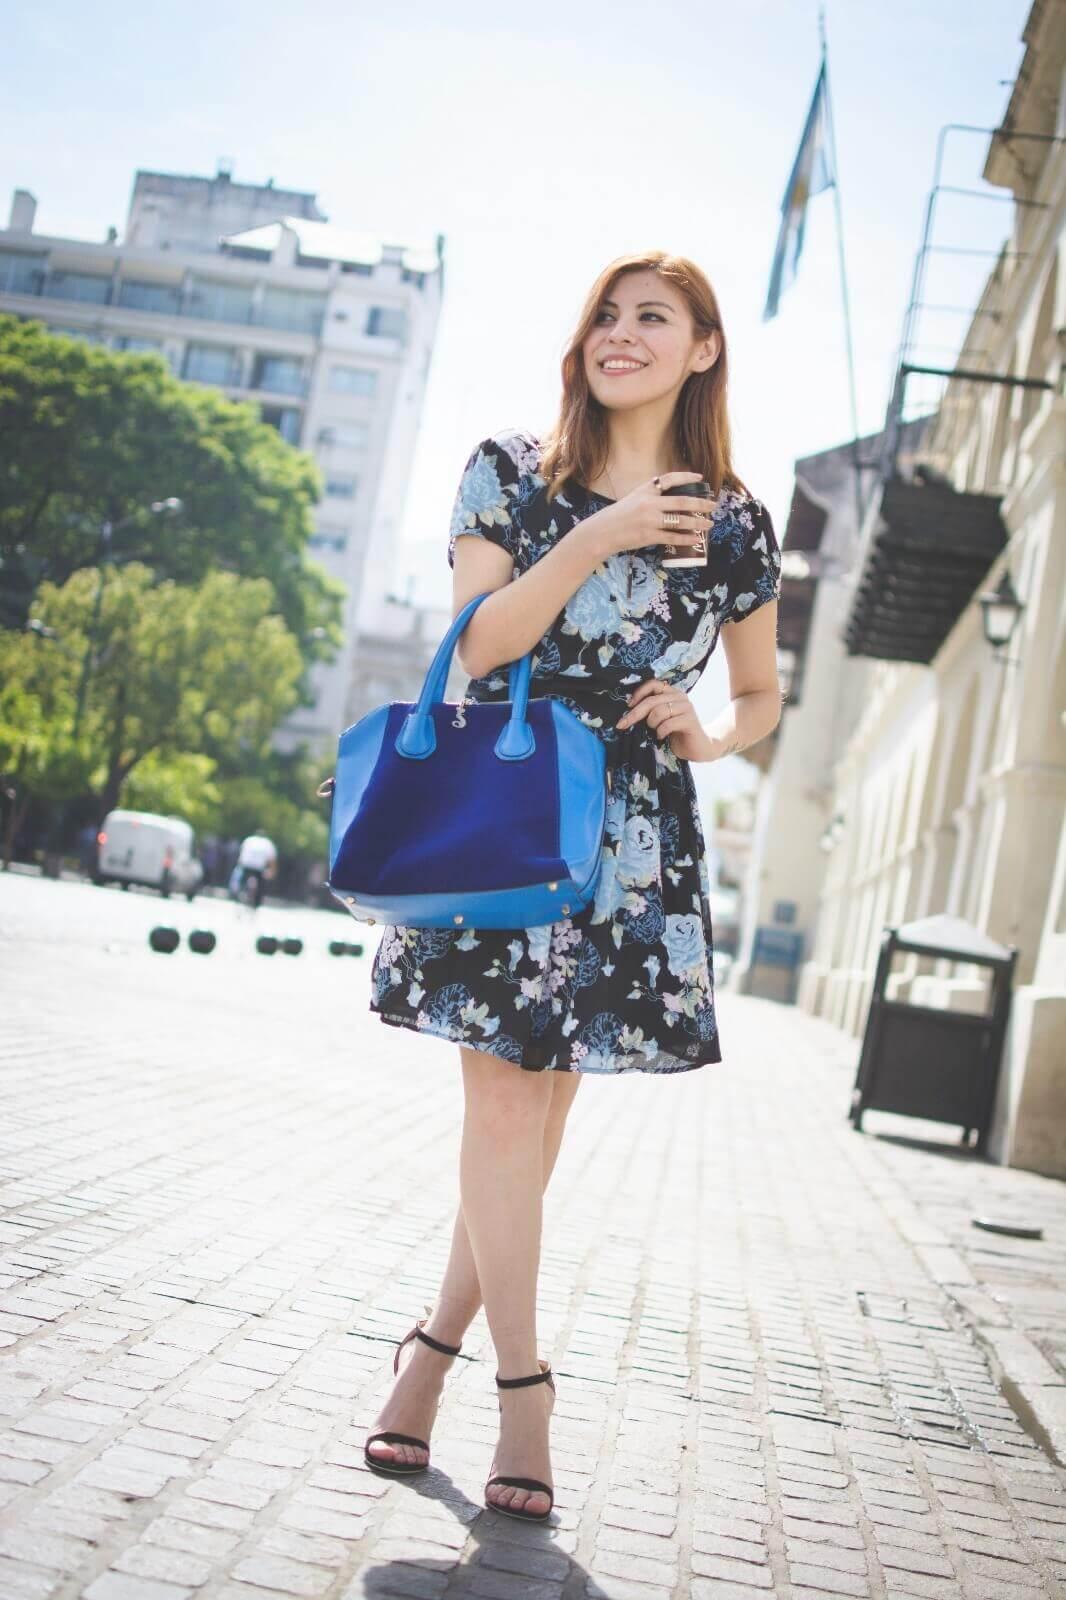 gamiss-black-strappy-sandals-blue-floral-dress-rosegal-cobalt-blue-tote-bag-deborah-ferrero-style-by-deb14